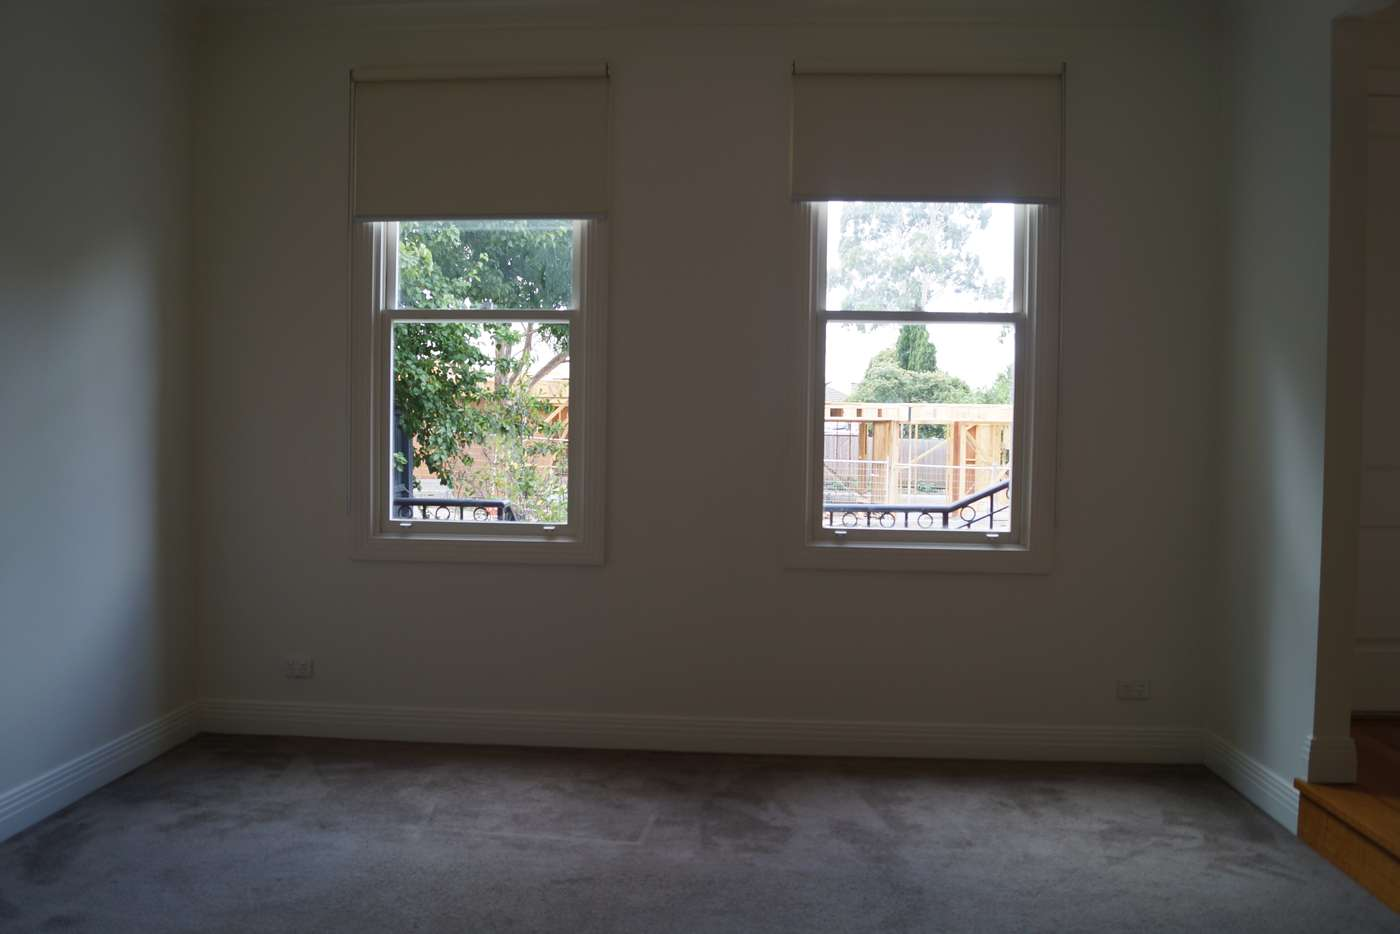 Sixth view of Homely house listing, 5B Como Street, Alphington VIC 3078